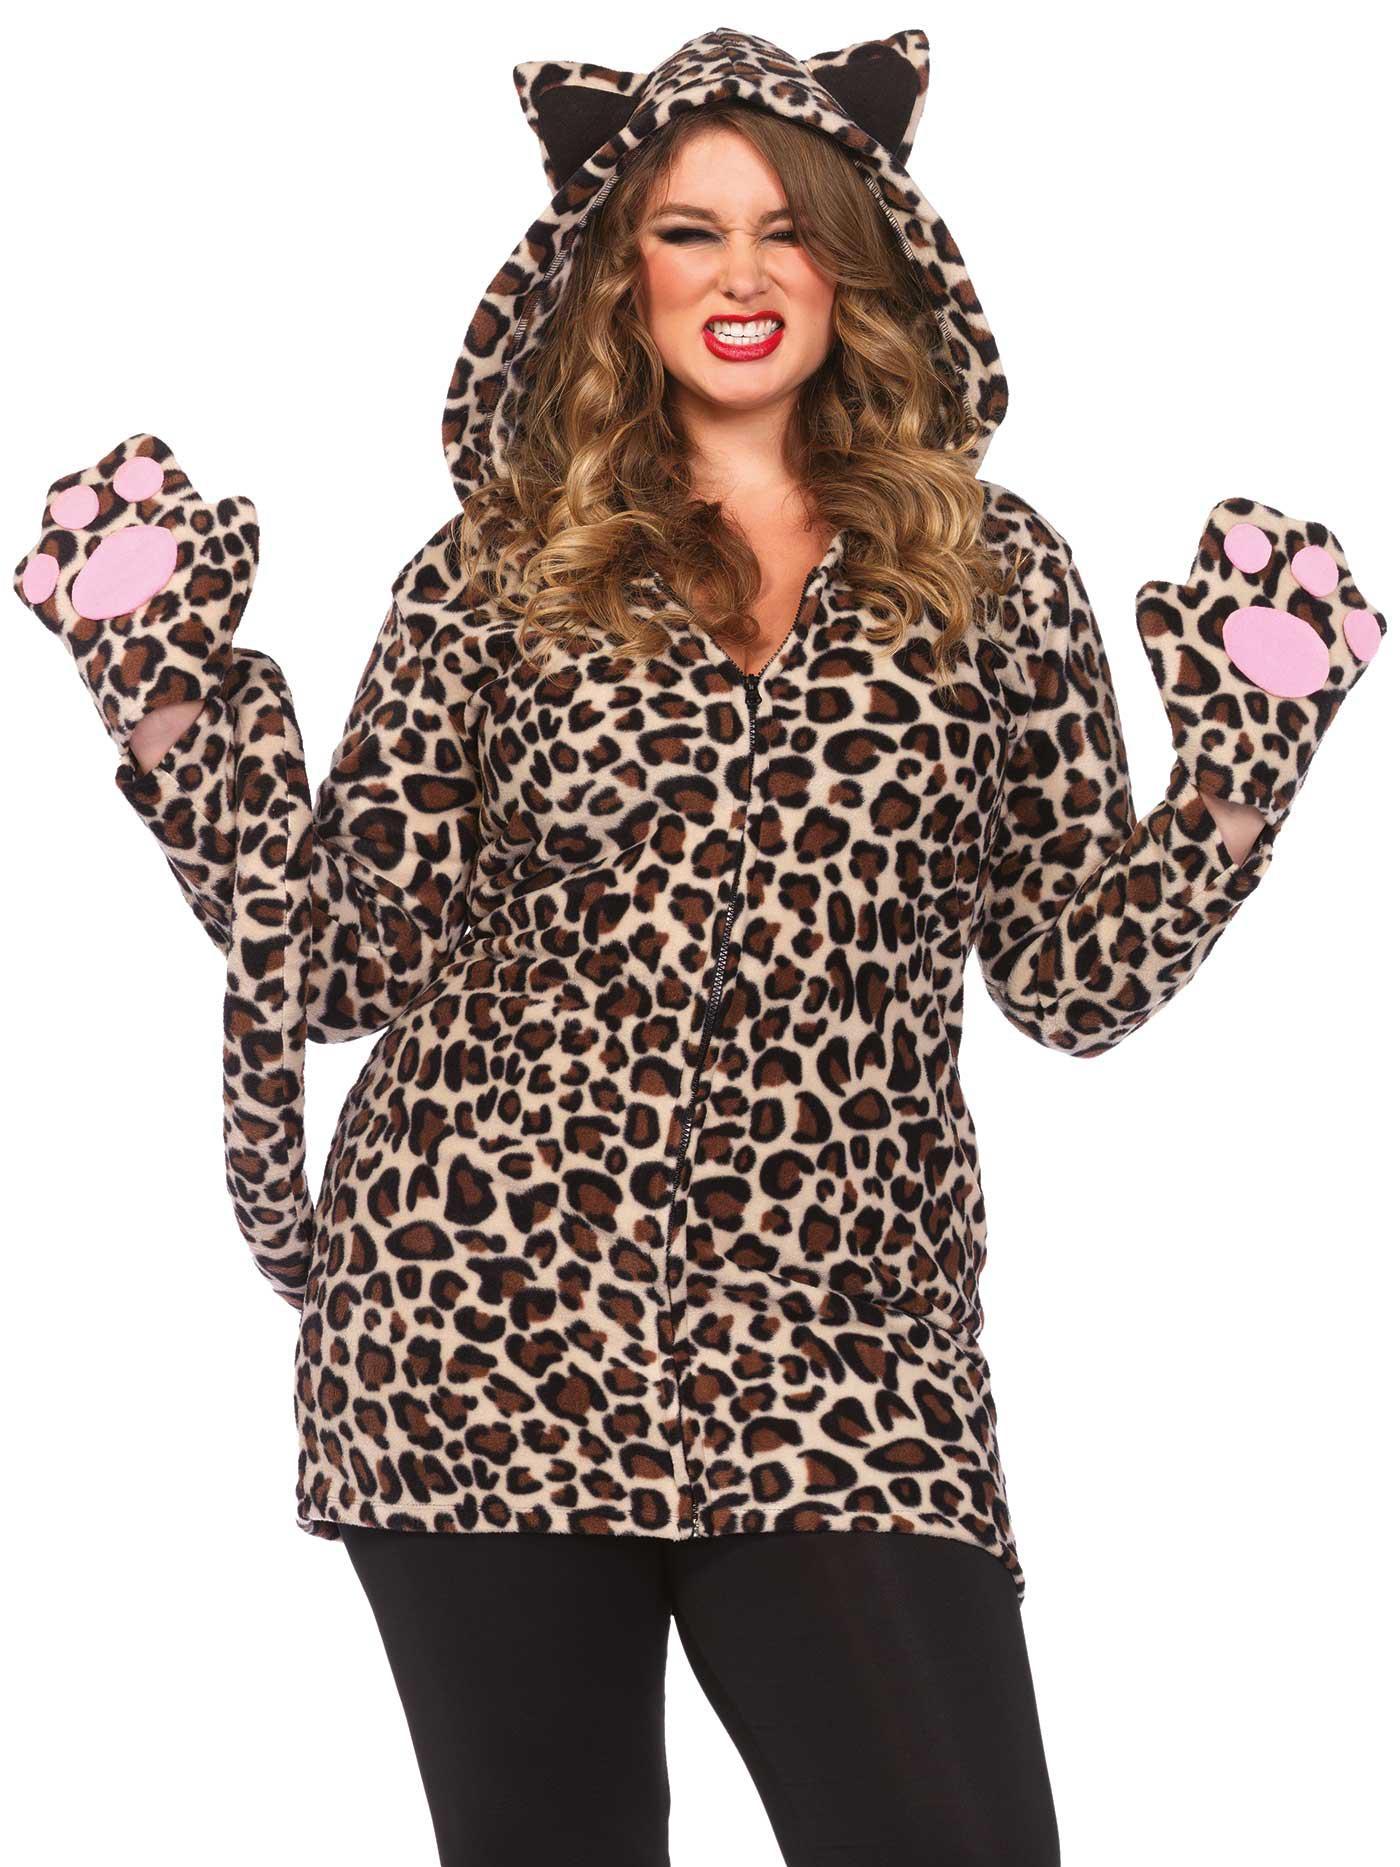 leoparden kost m f r damen in gro er gr e kost me f r erwachsene und g nstige faschingskost me. Black Bedroom Furniture Sets. Home Design Ideas